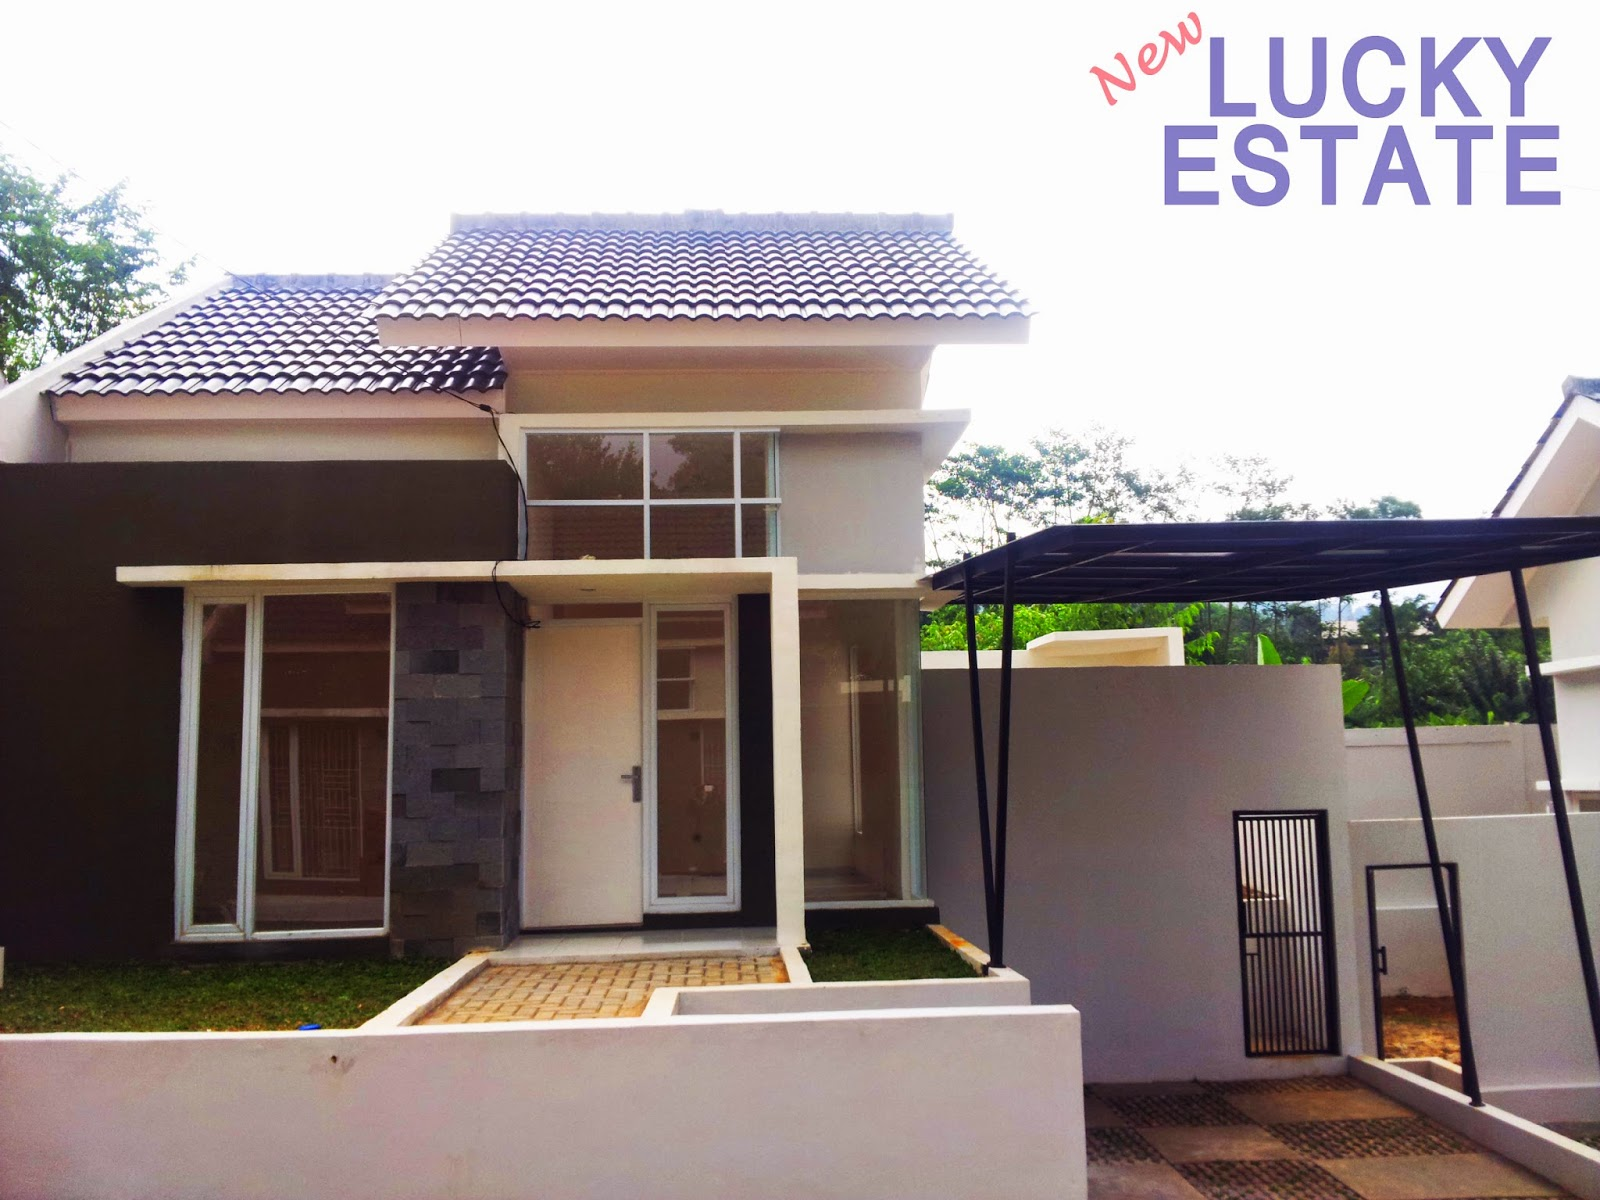 Gaya Terbaru Perumahan Minimalis Di Bandung, Rumah Minimalis